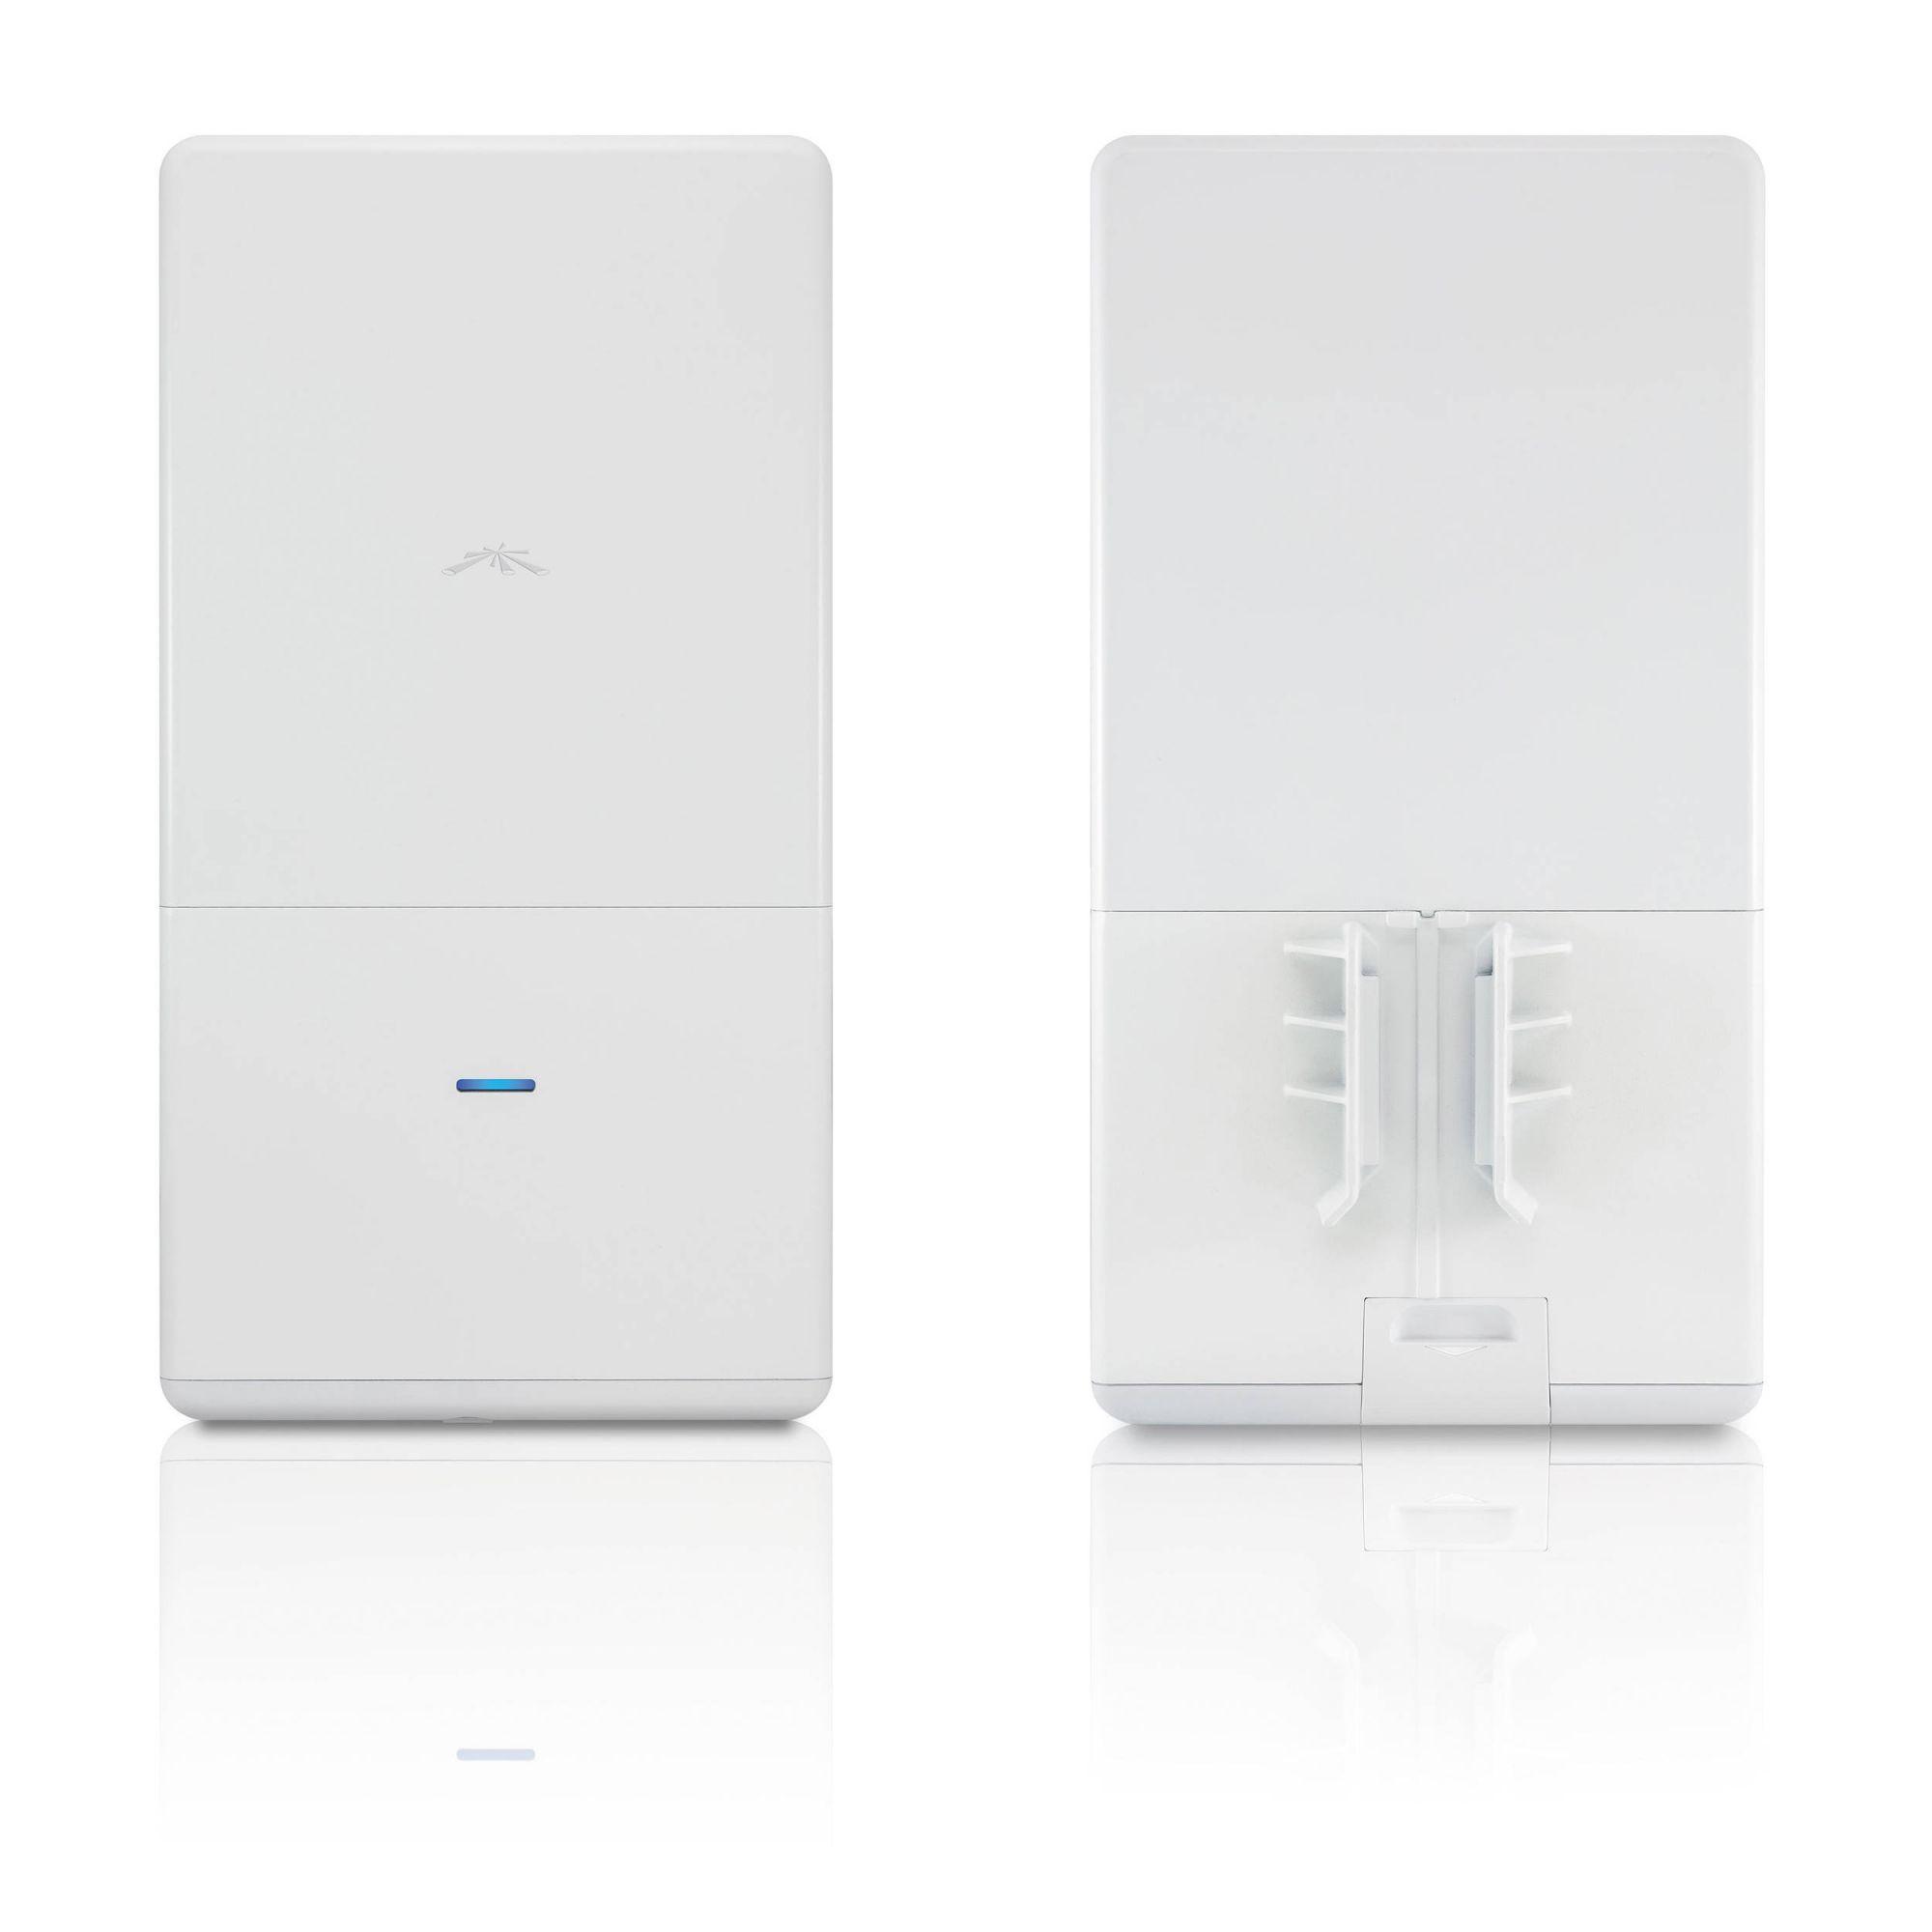 UBNT UAP-AC OUTDOOR 2.4GHZ/5GHZ UNIFI AP  - TECTECH BRASIL COMPUTERS